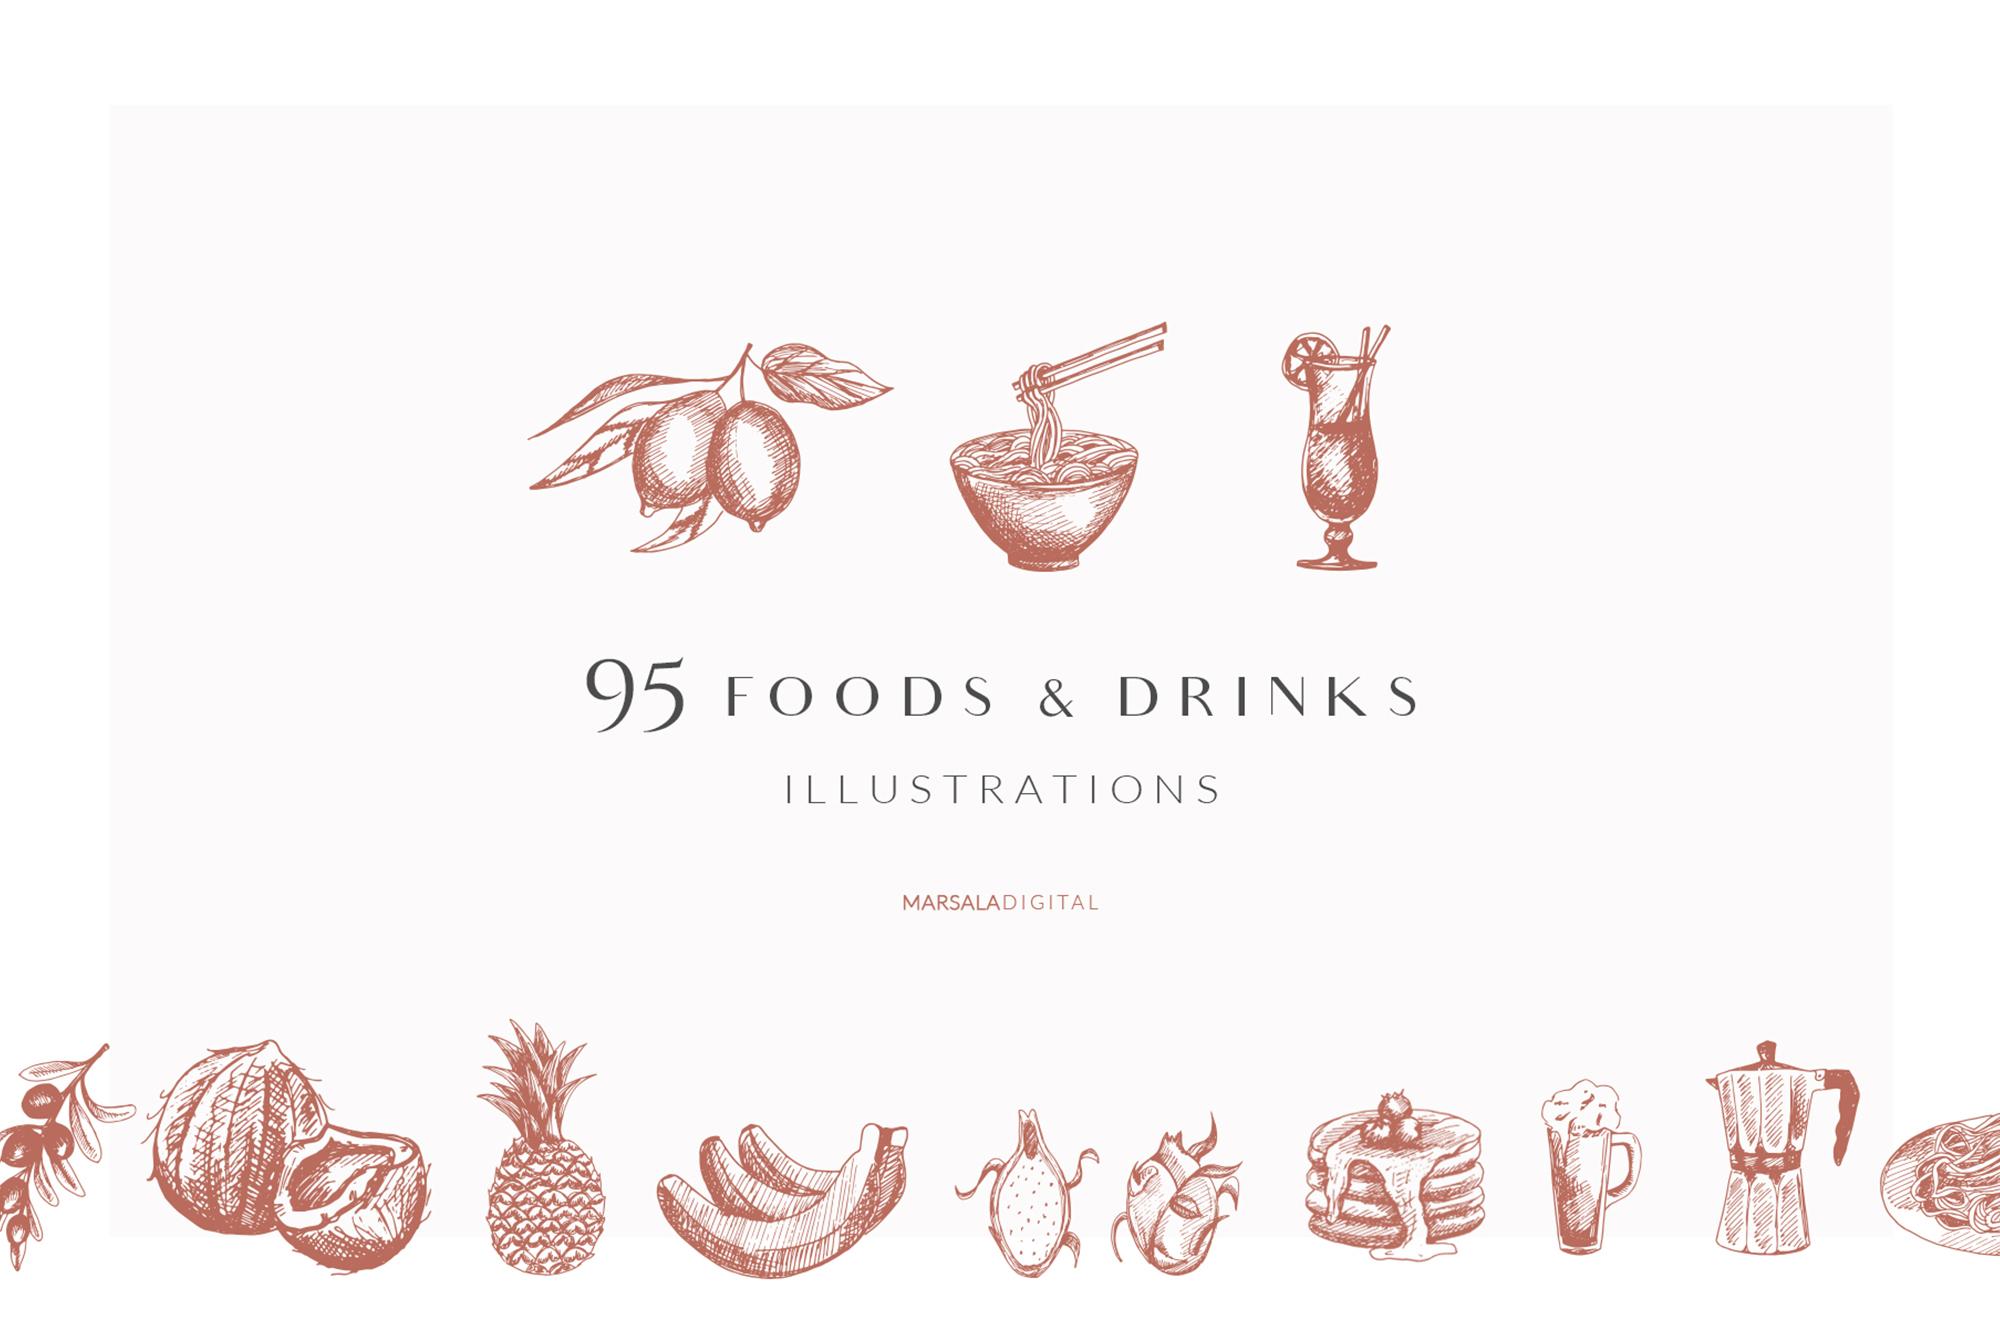 Foods & Drinks Logo Elements Handrawn Graphics example image 1